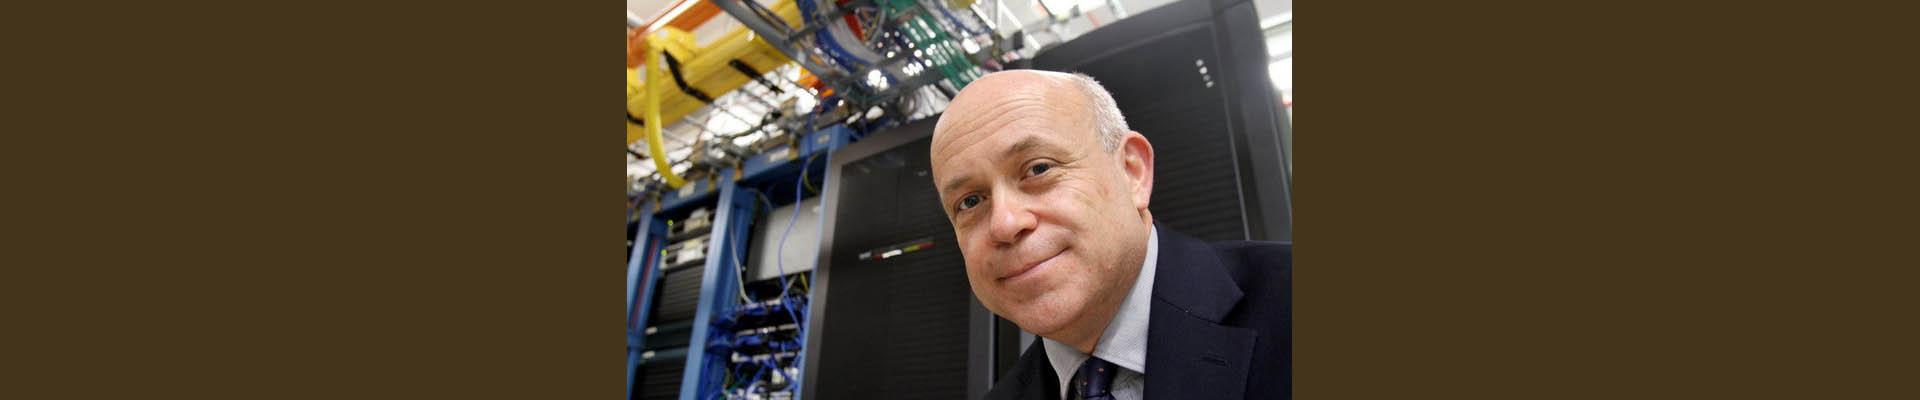 Kevin Goodman, BlueBridge Networks